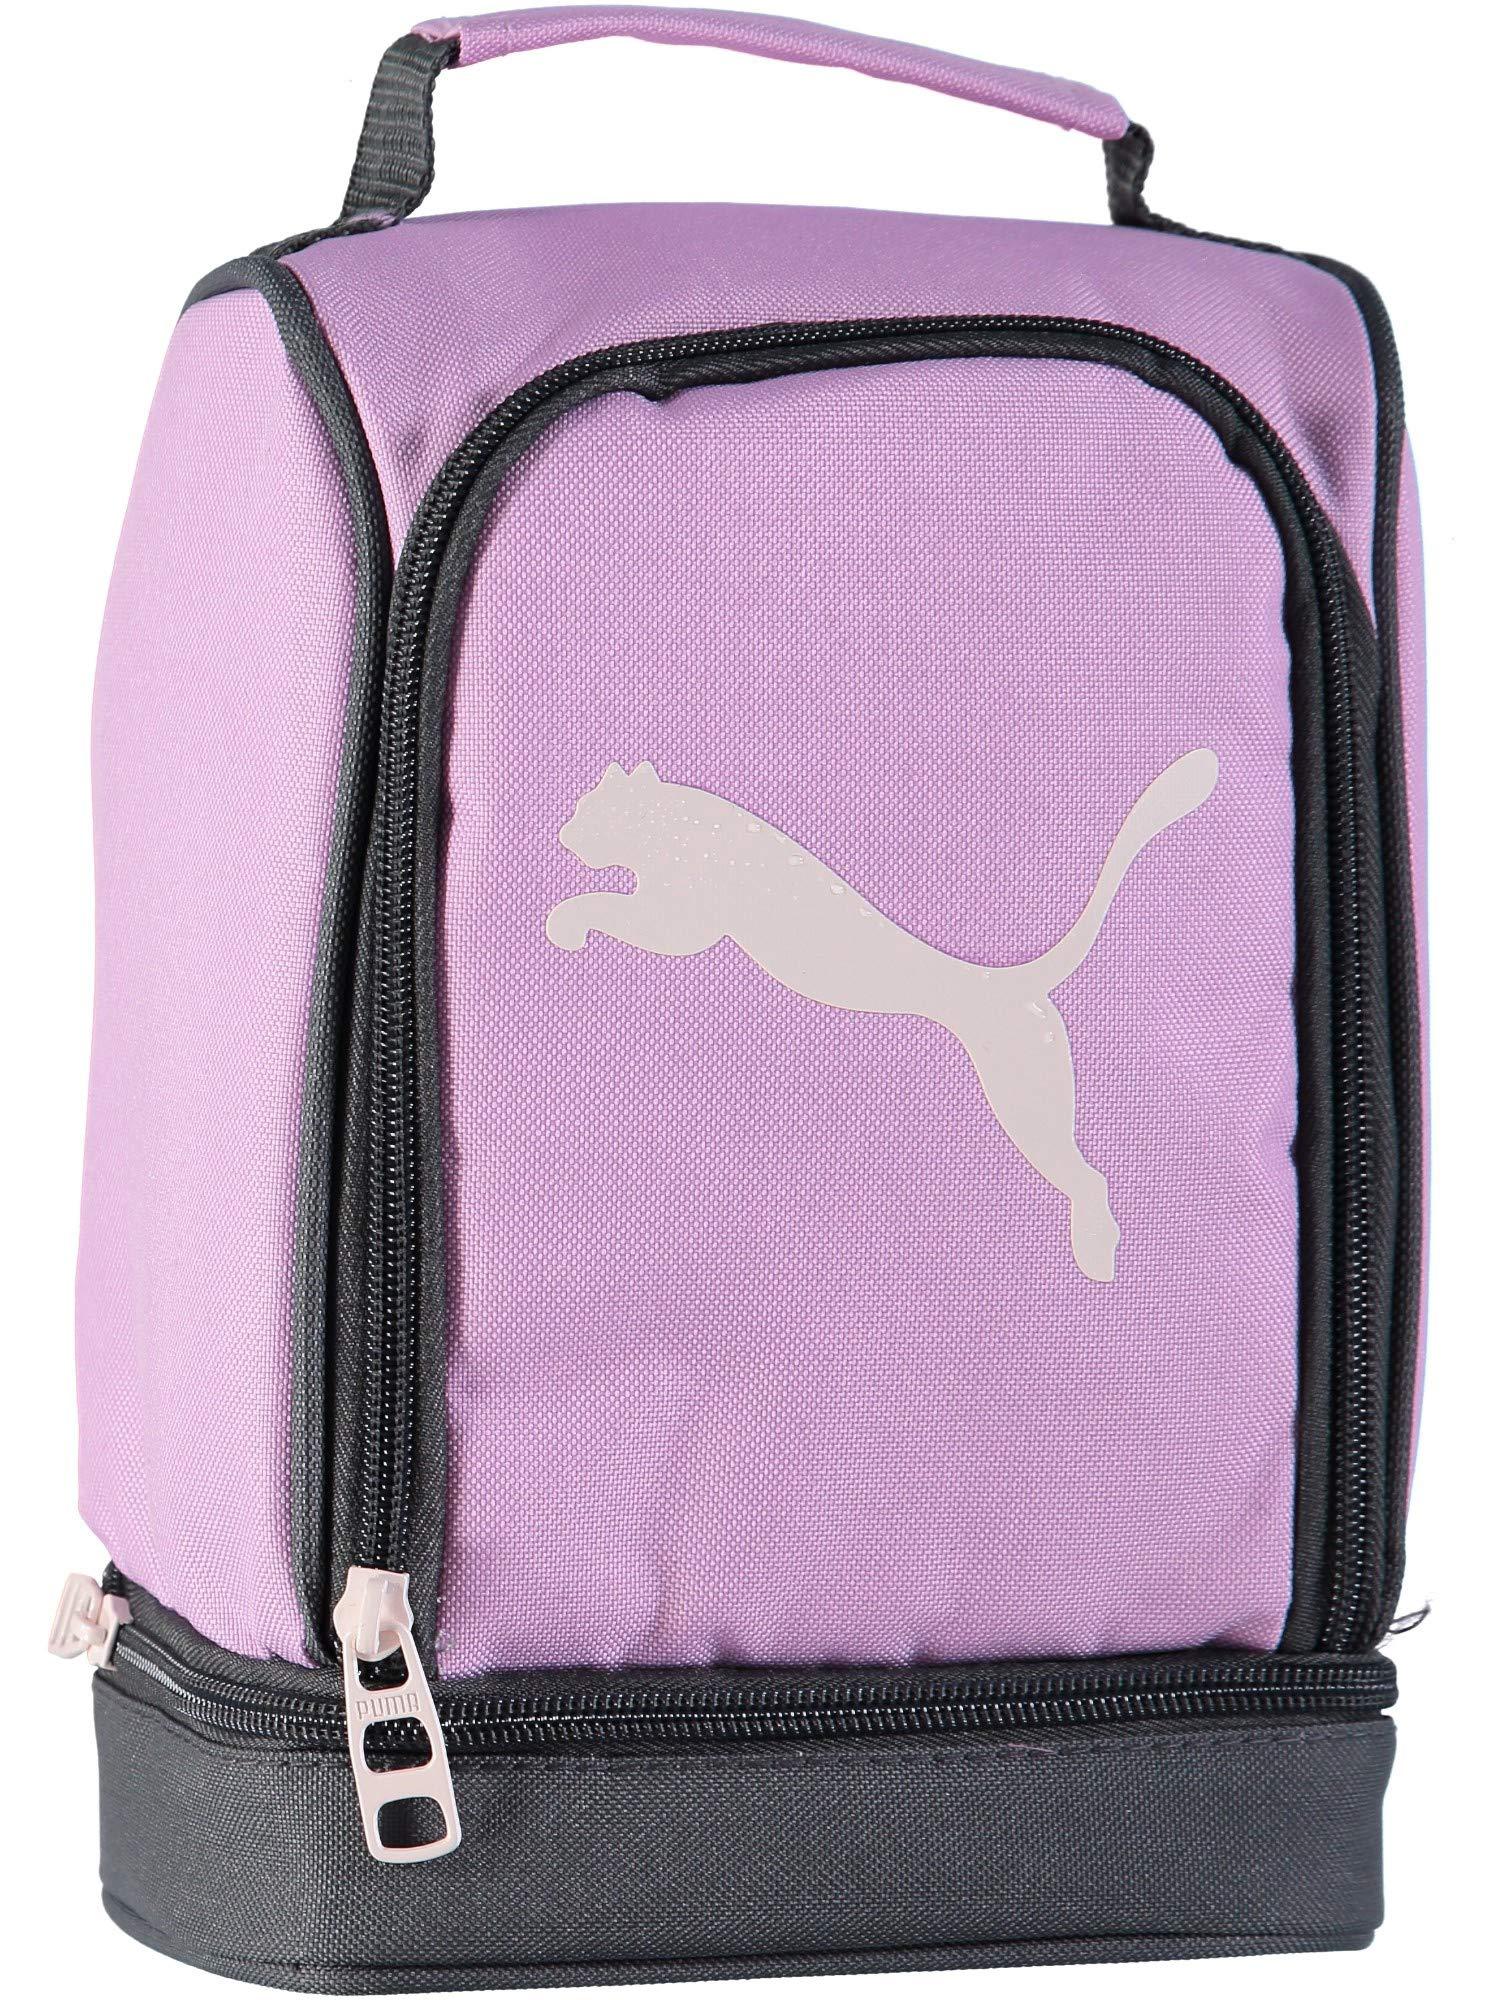 PUMA Big Girls' Evercat Stacker 2.0 Lunch Box, Pink/Grey, OS